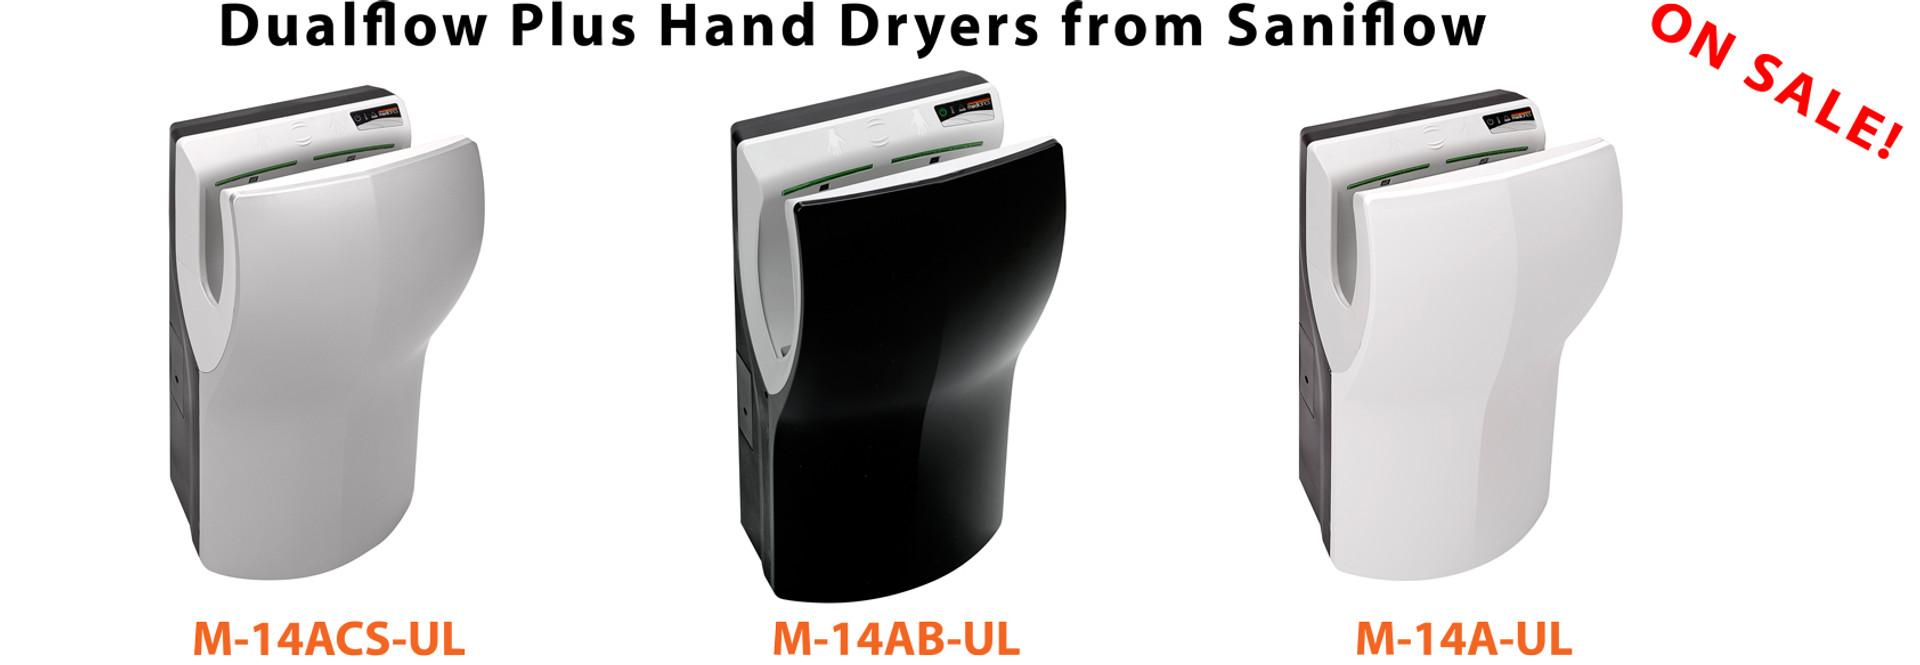 Dualflow Plus Hand Dryers on Sale Now